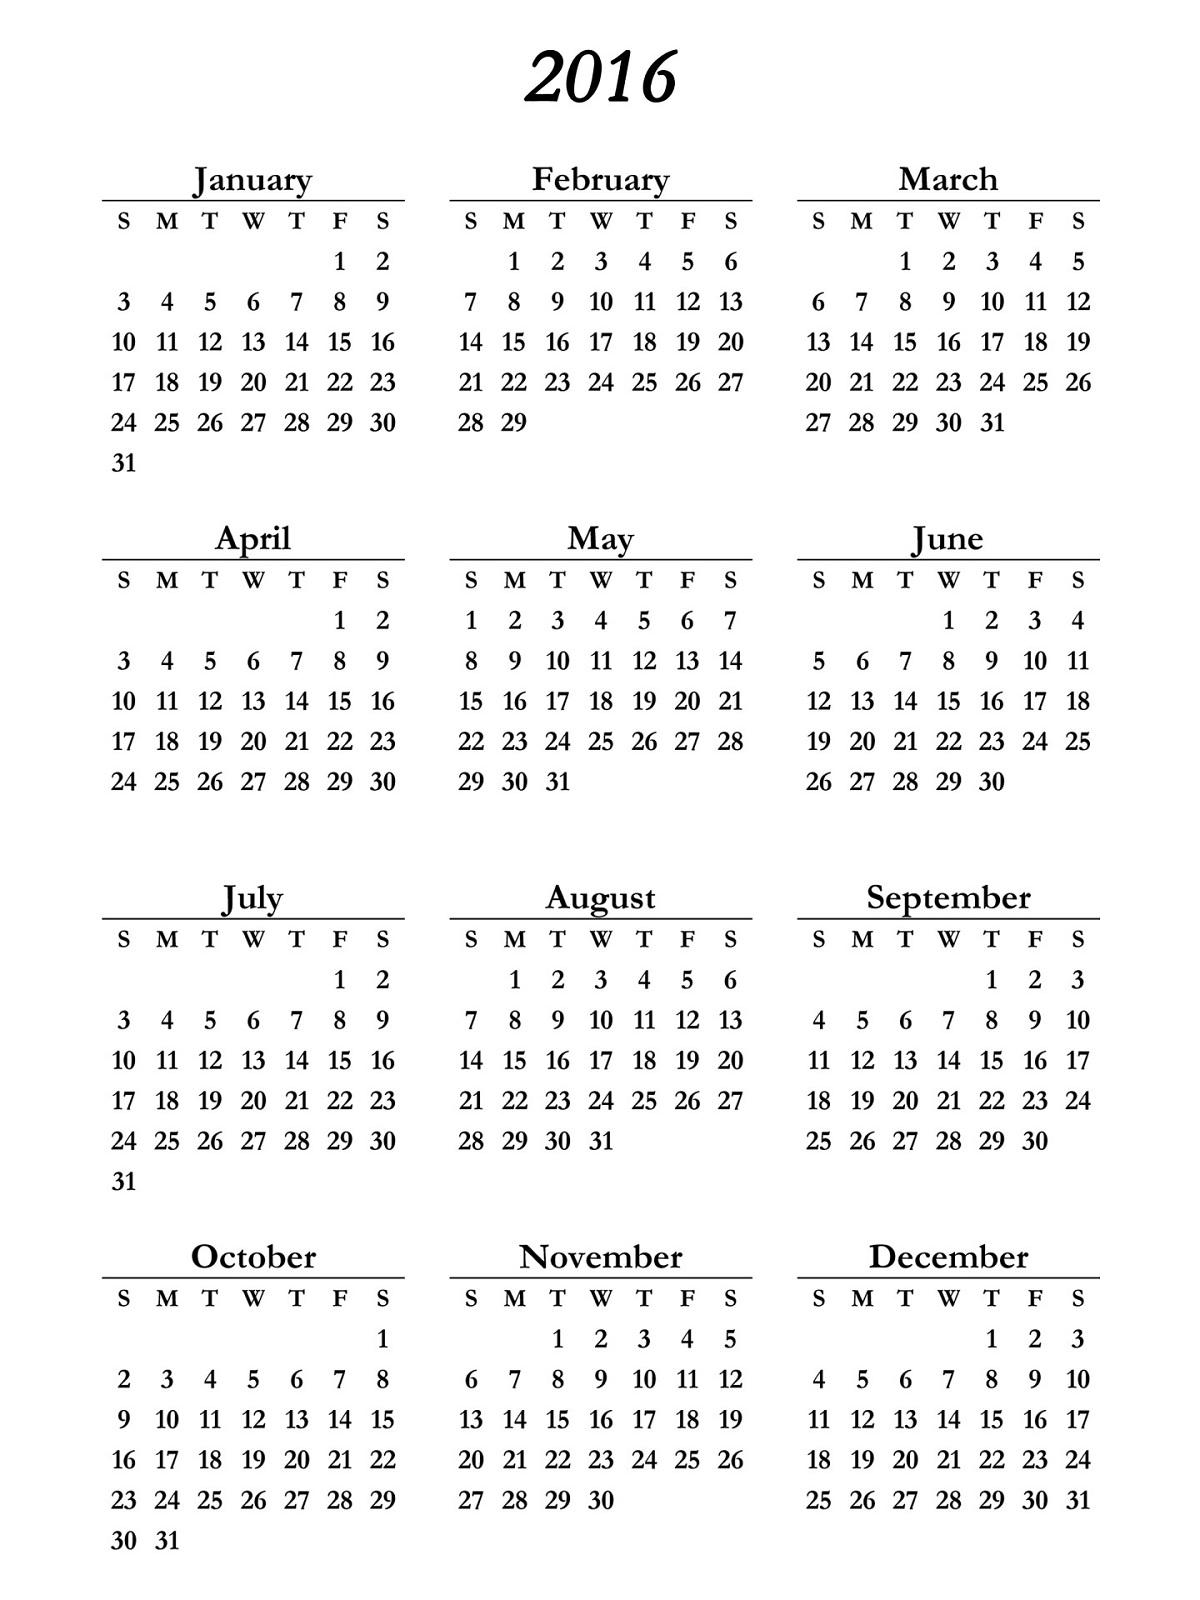 image via calendarpedia.co.uk